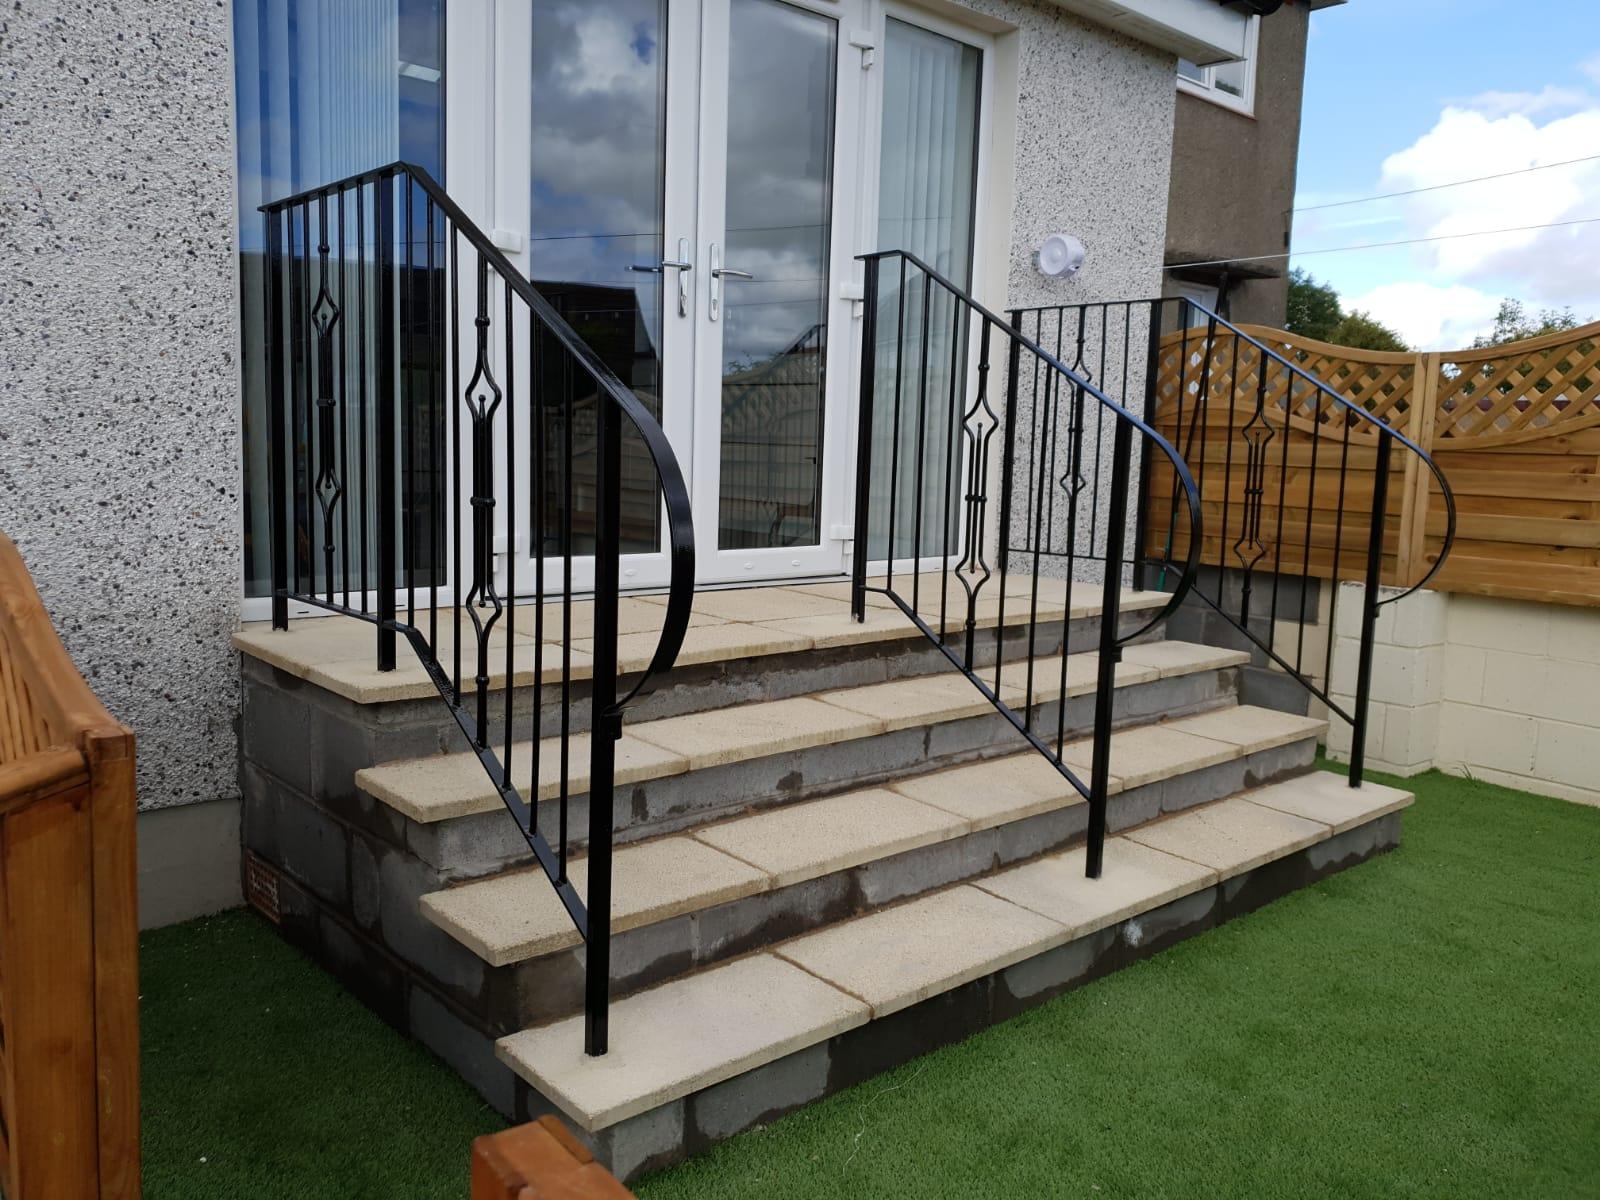 Pretty metal handrails by Dain Art Iron, Ayrshire, Scotland.